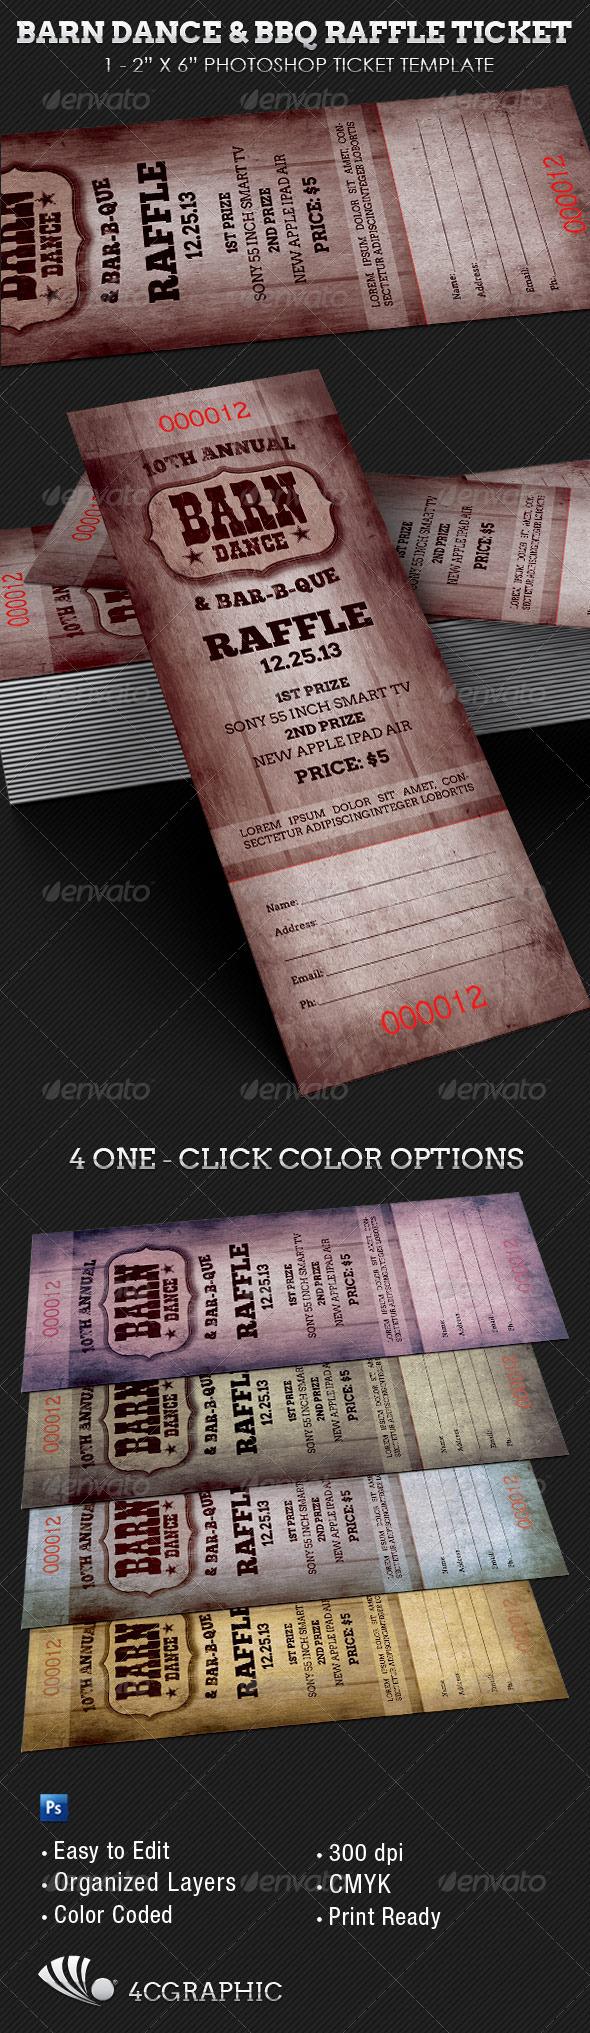 dance ticket template